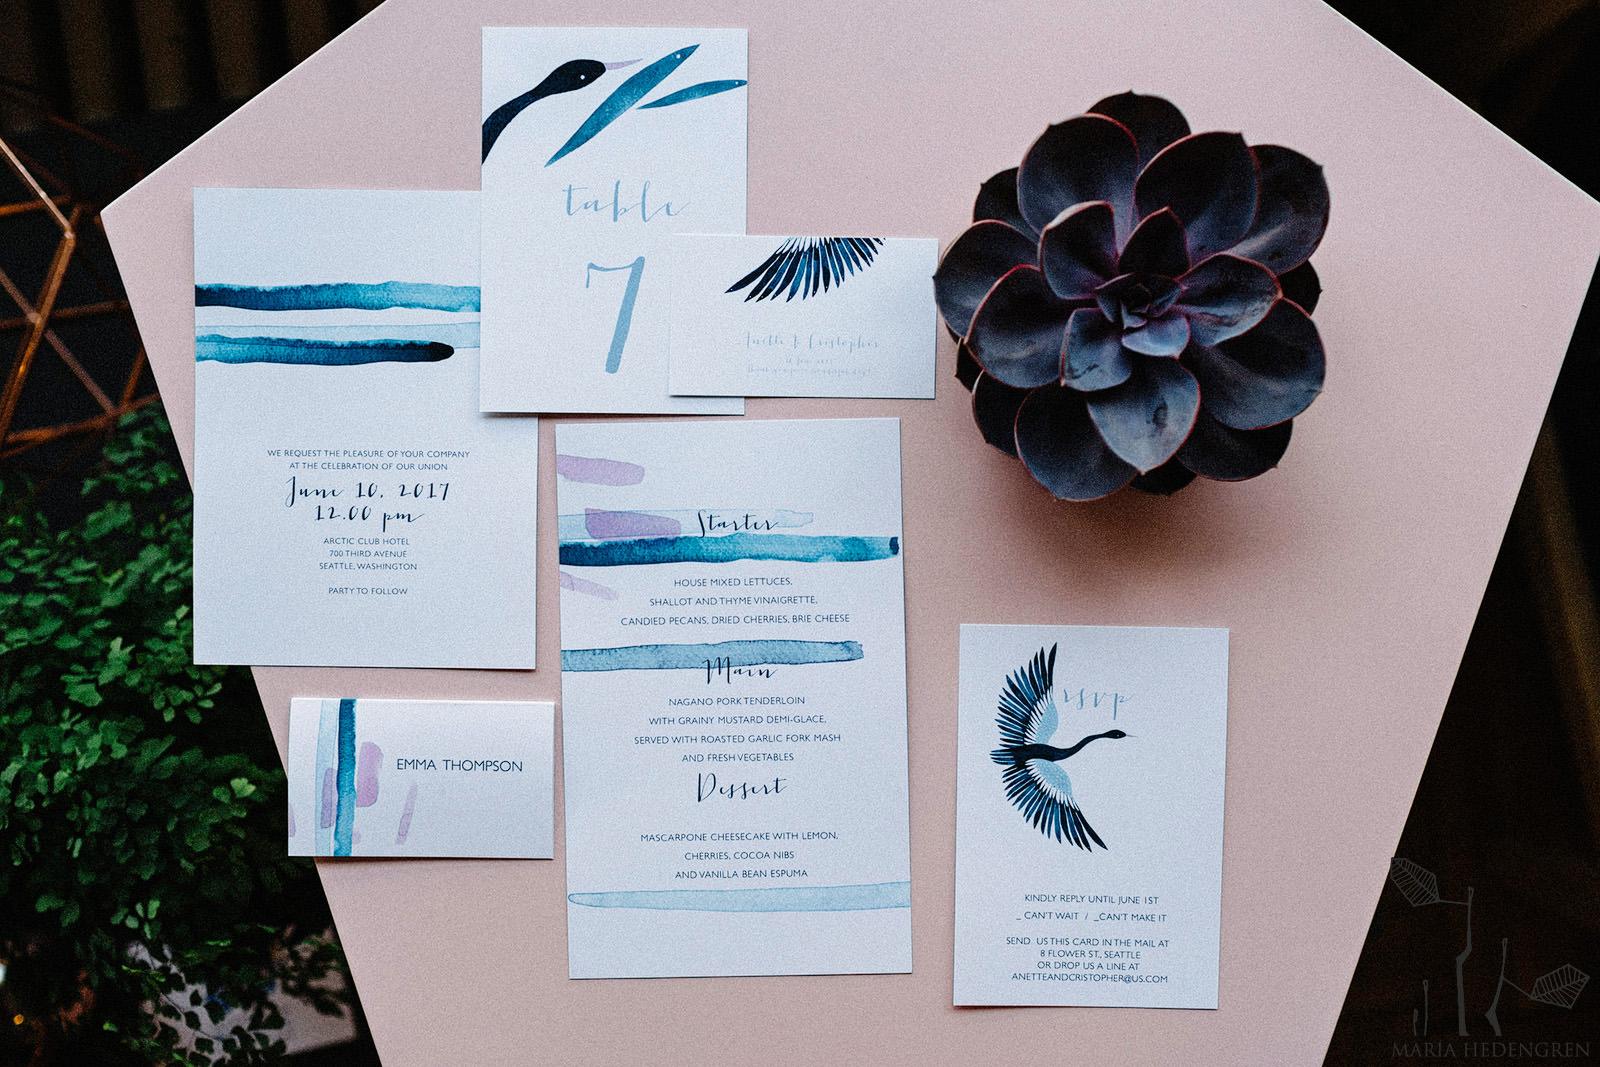 Nordic Wedding invitations